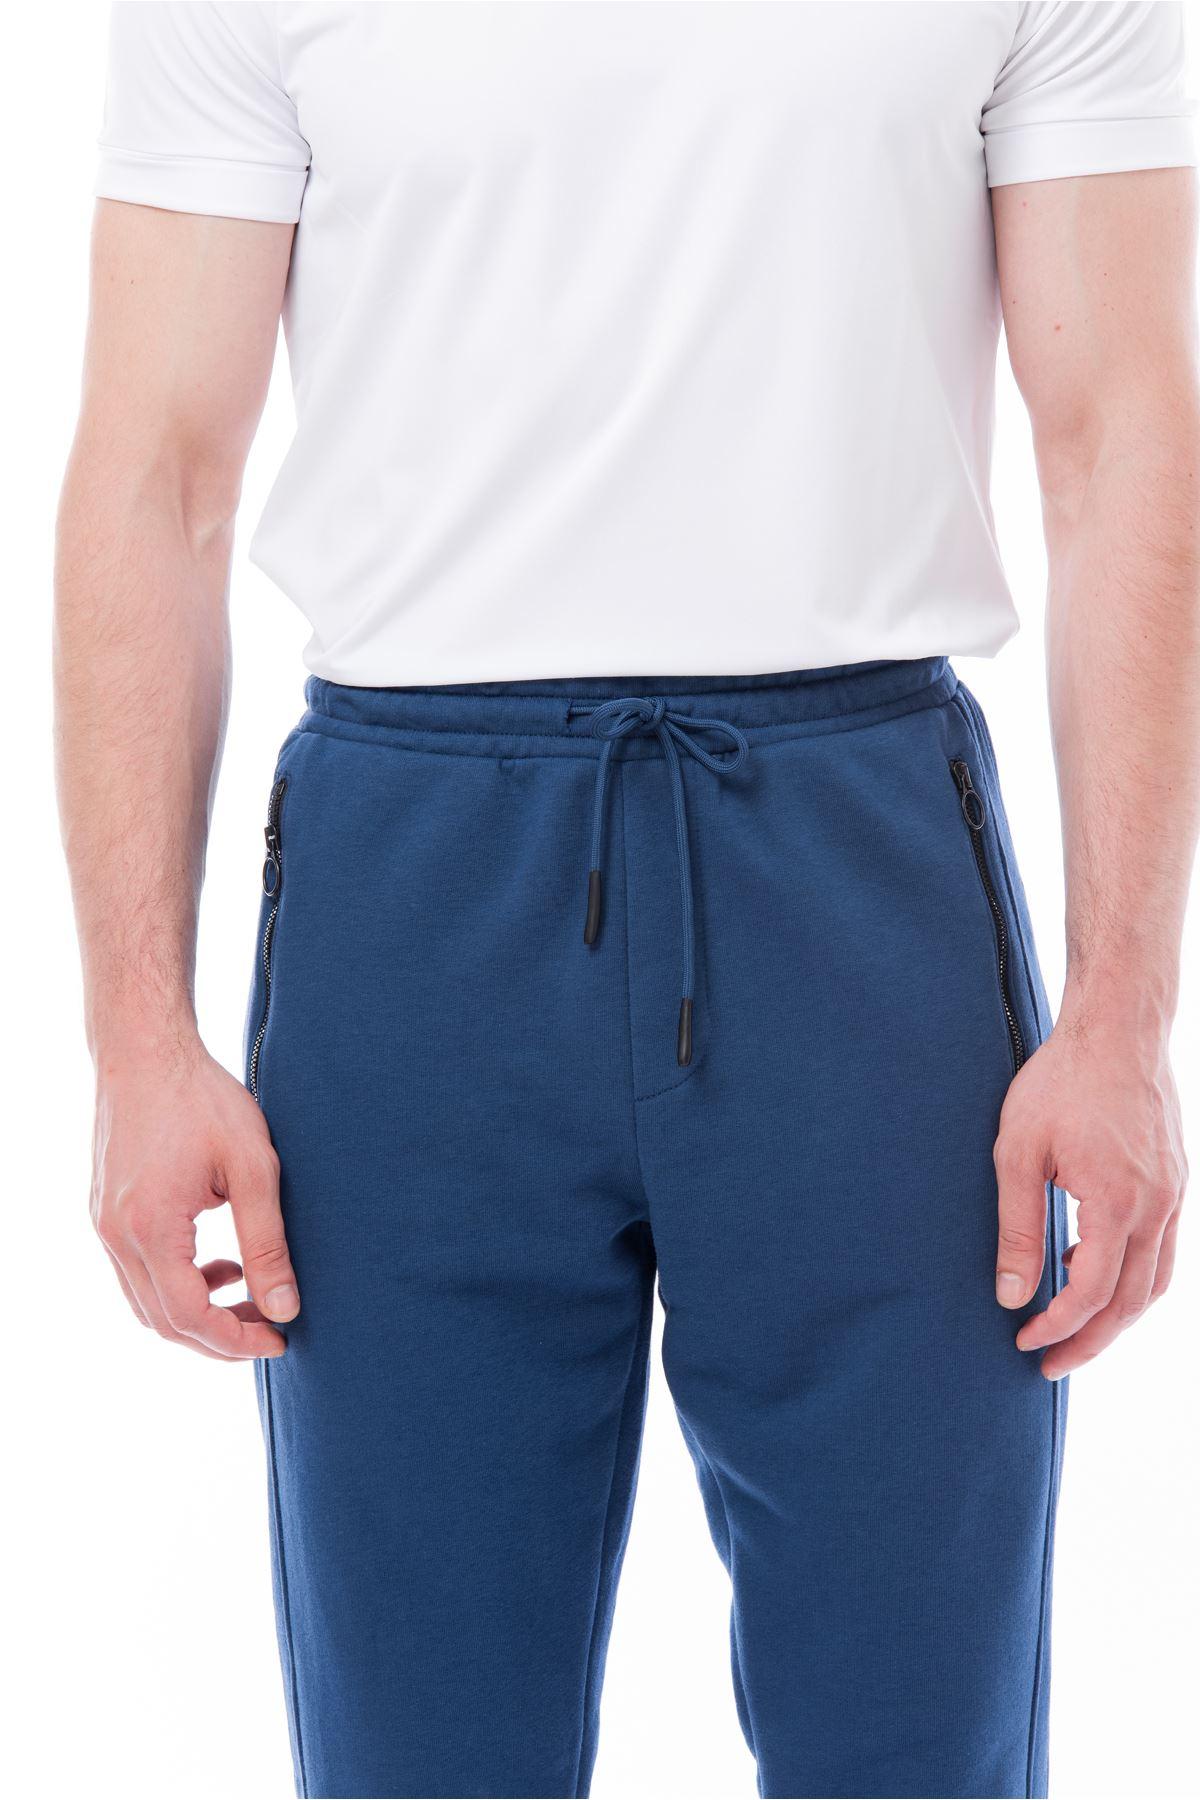 İndigo Beli Lastikli Eşofman Altı Jogger Pantolon